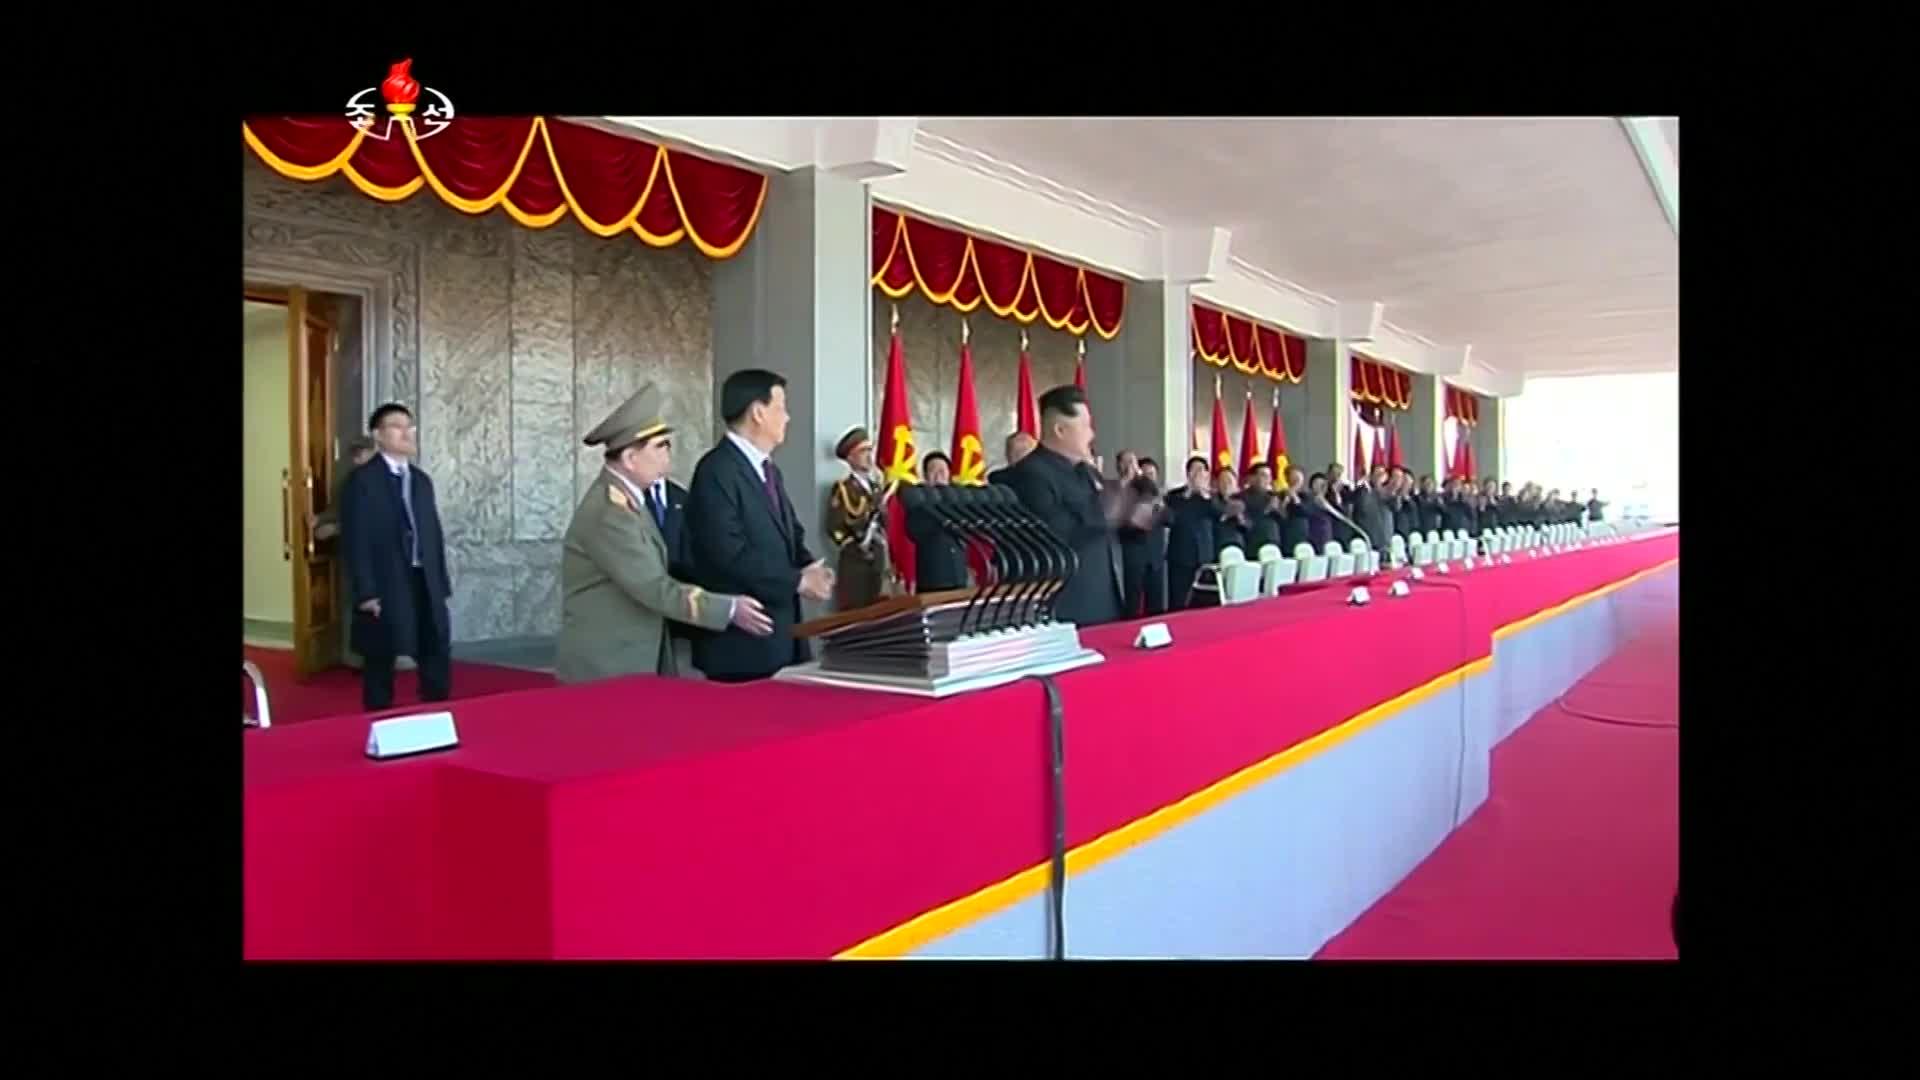 U.S. preparing for talks with North Korea - report